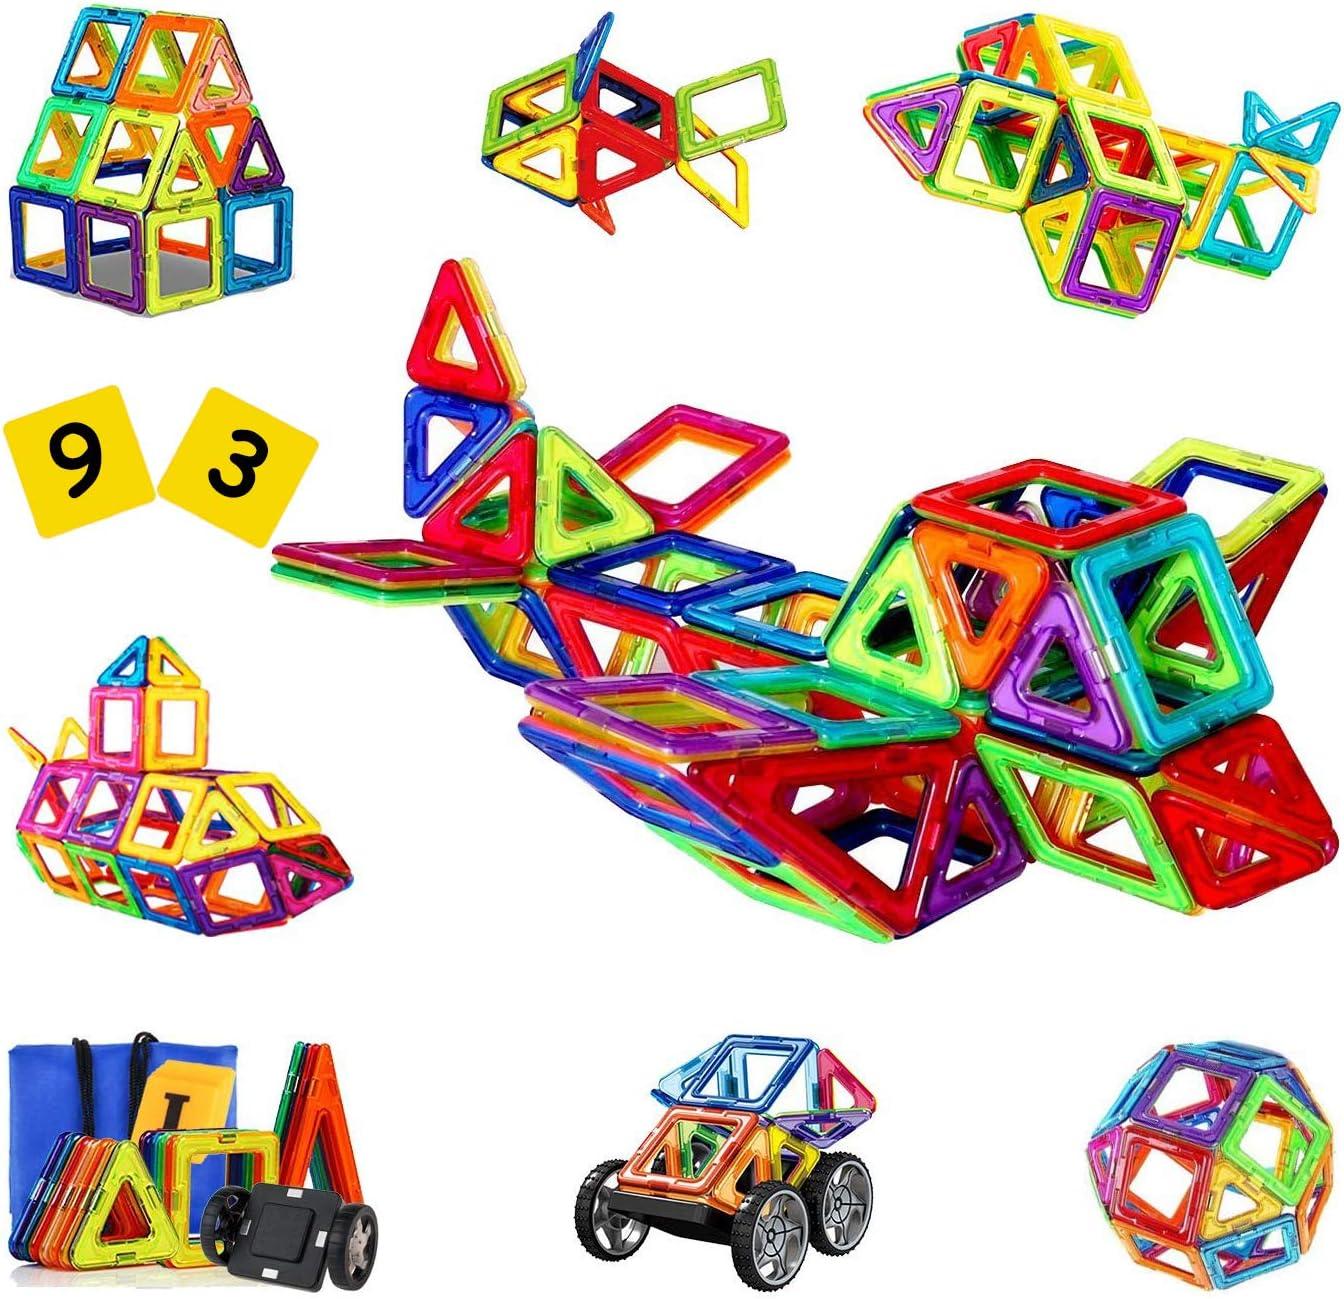 110Pcs Magnet Building Blocks Educational Toys Kids Colorful Gift Set Handbook